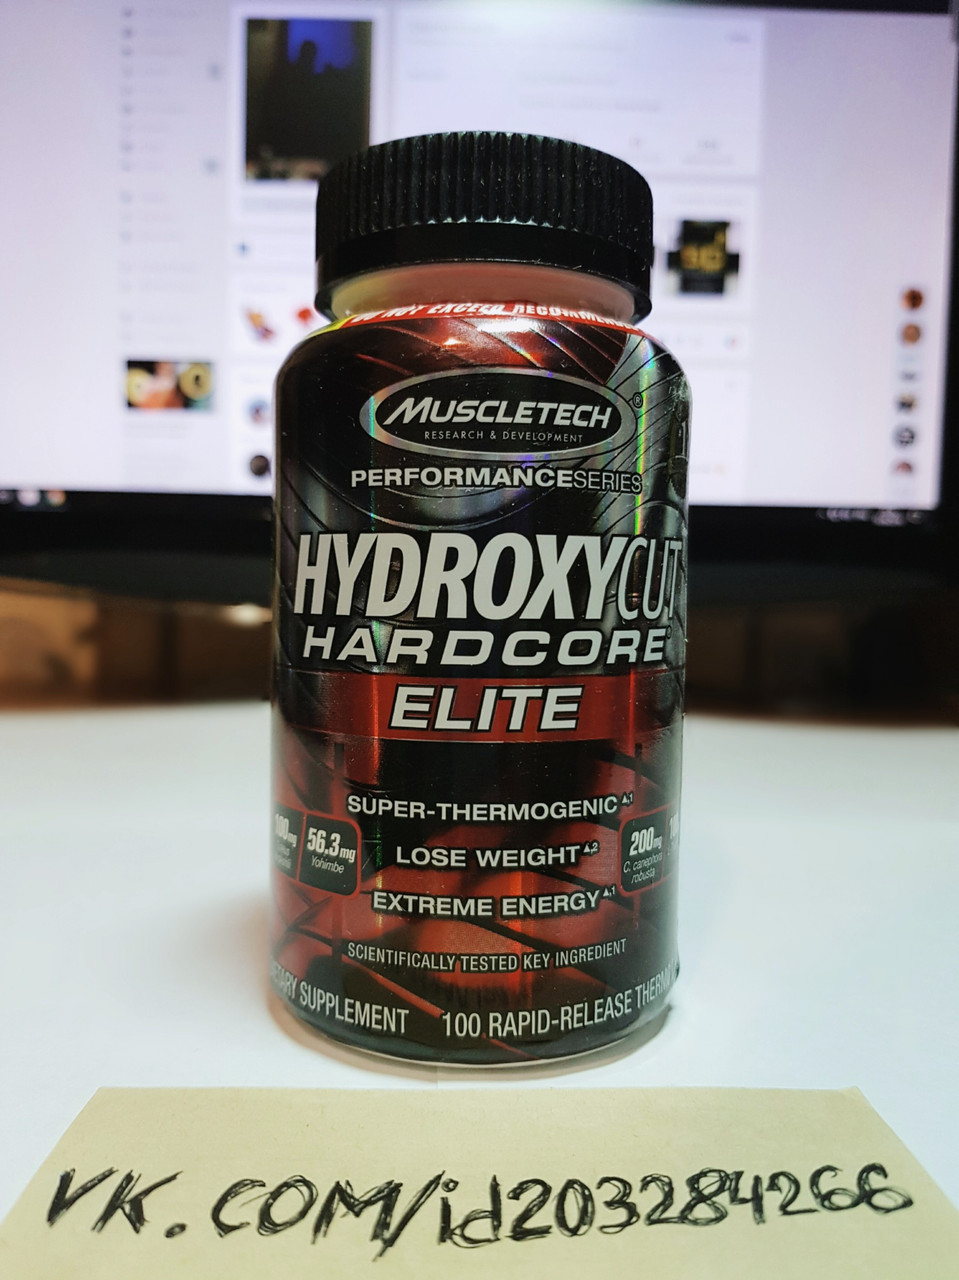 Жиросжигатель Muscletech Hydroxycut Hardcore Elite 100 капс гидроксикат